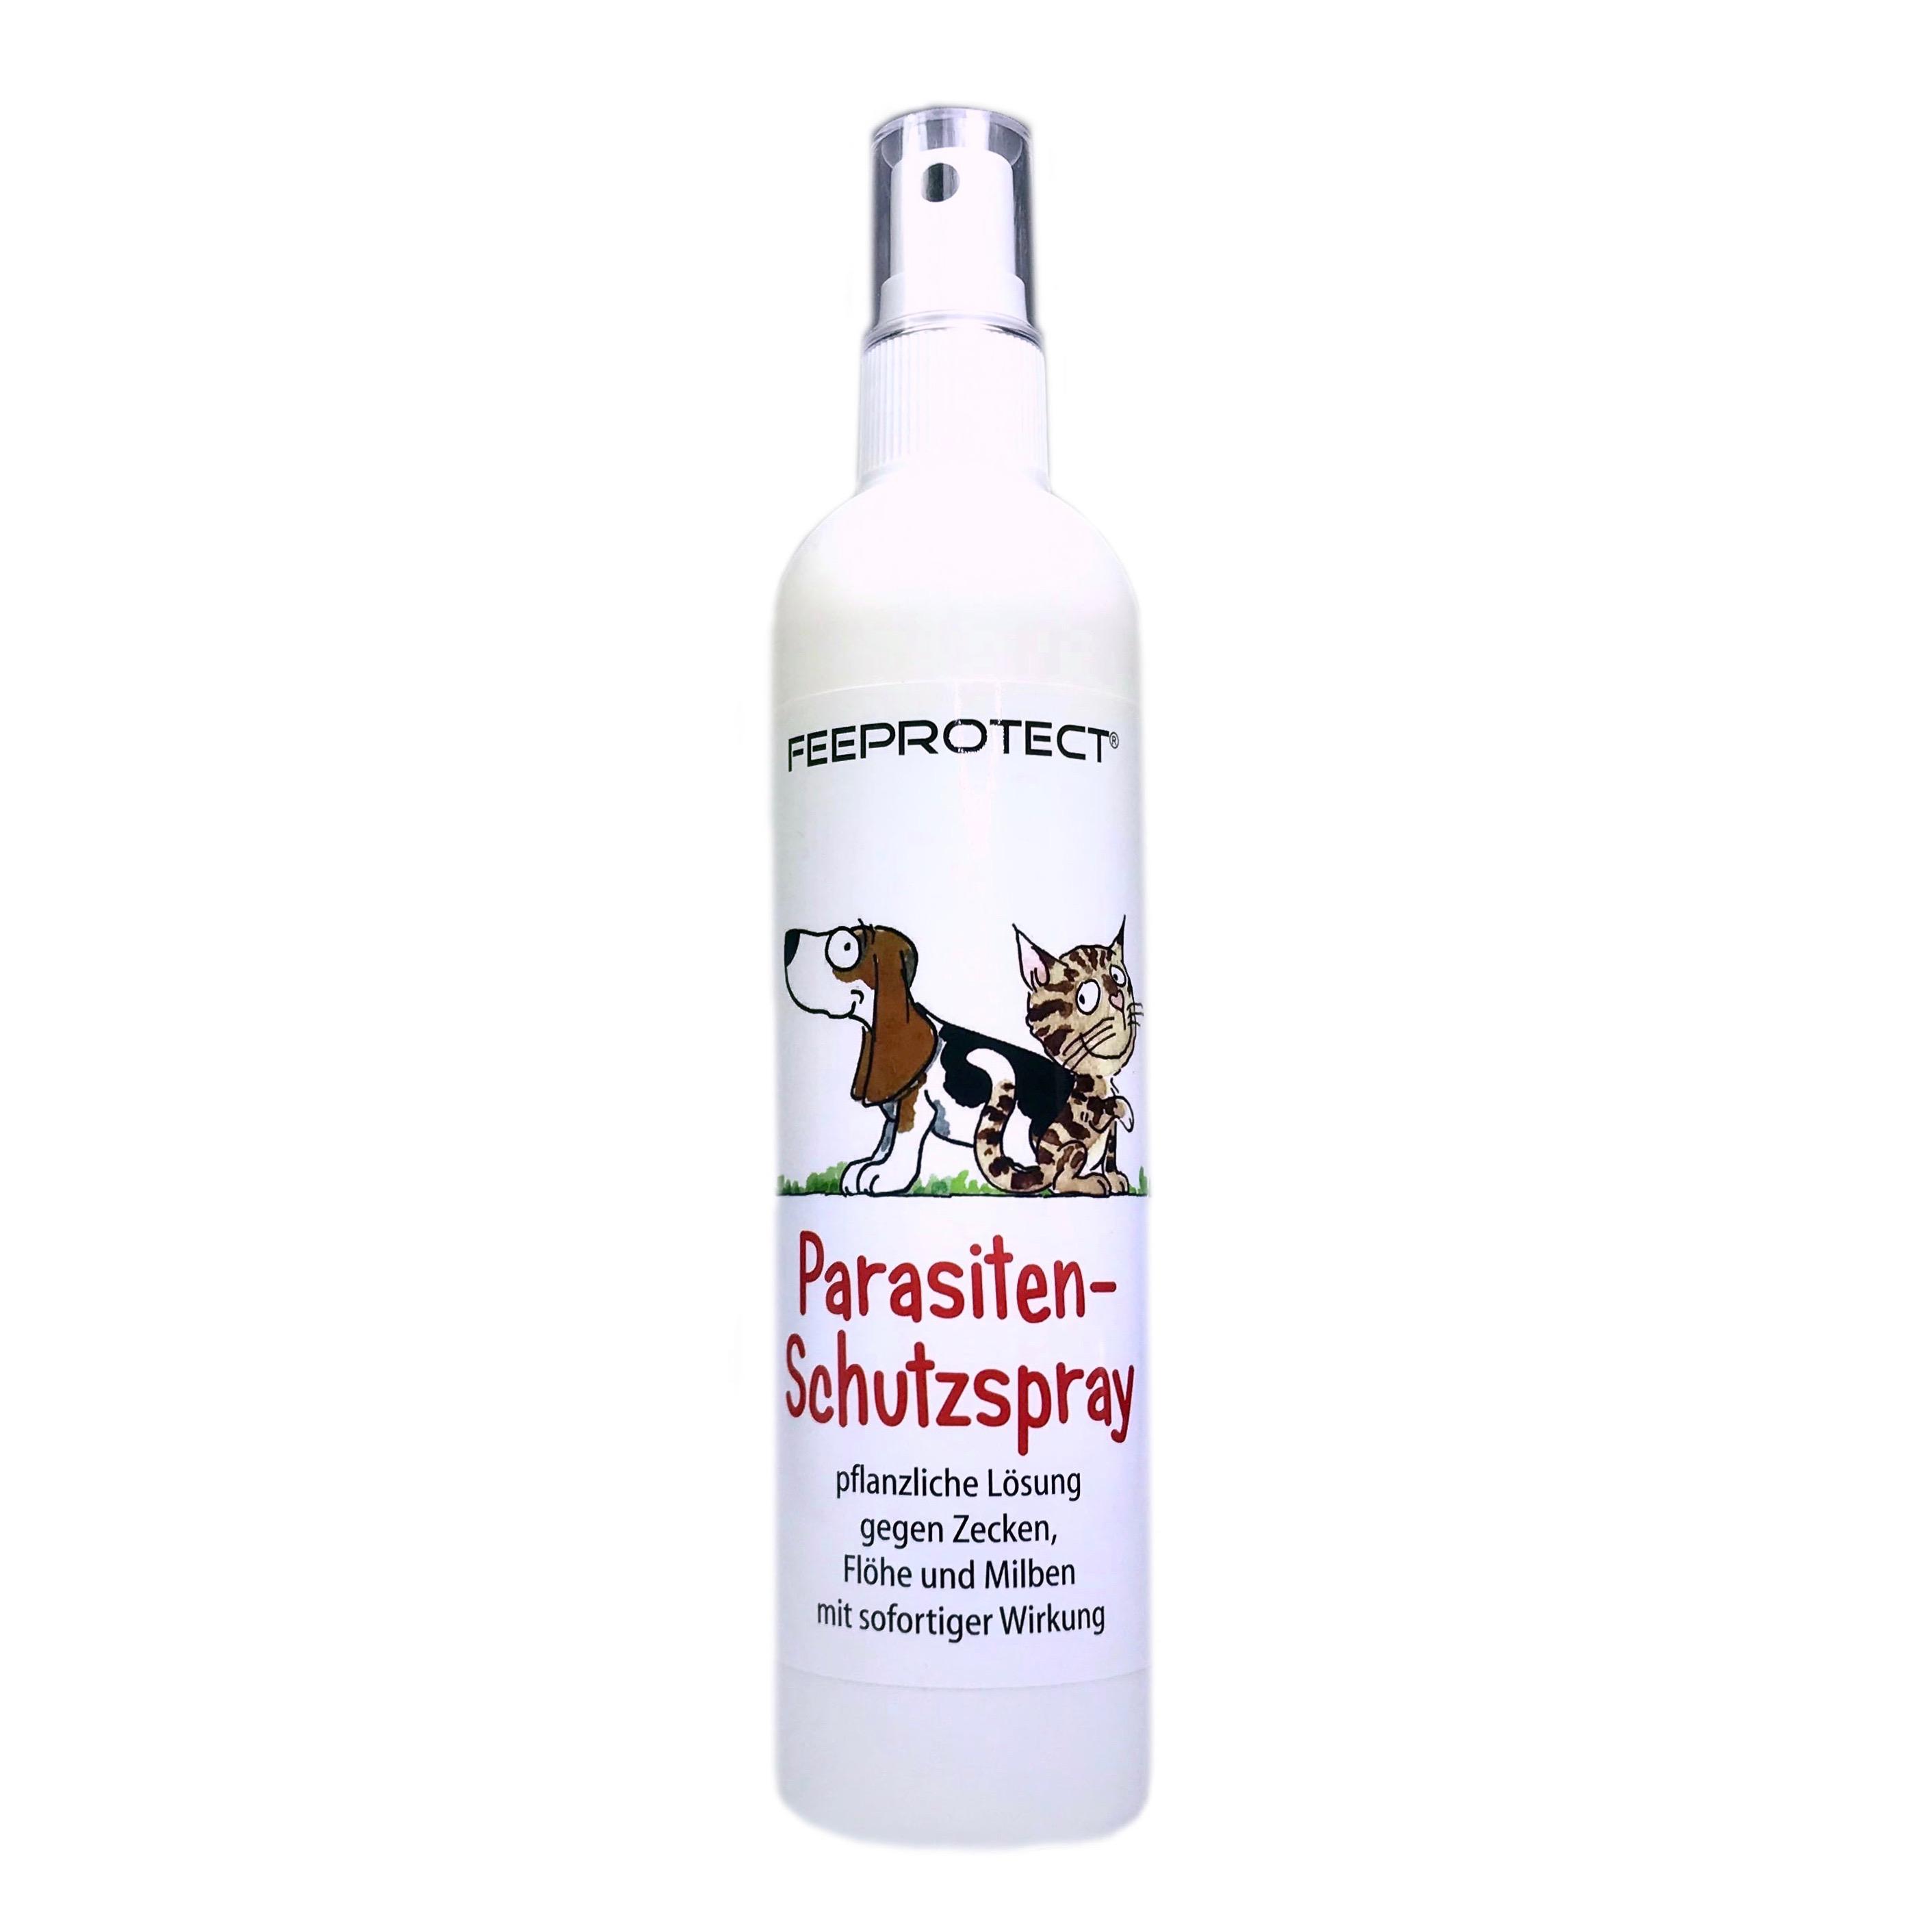 Feeprotect Parasiten-Schutzspray